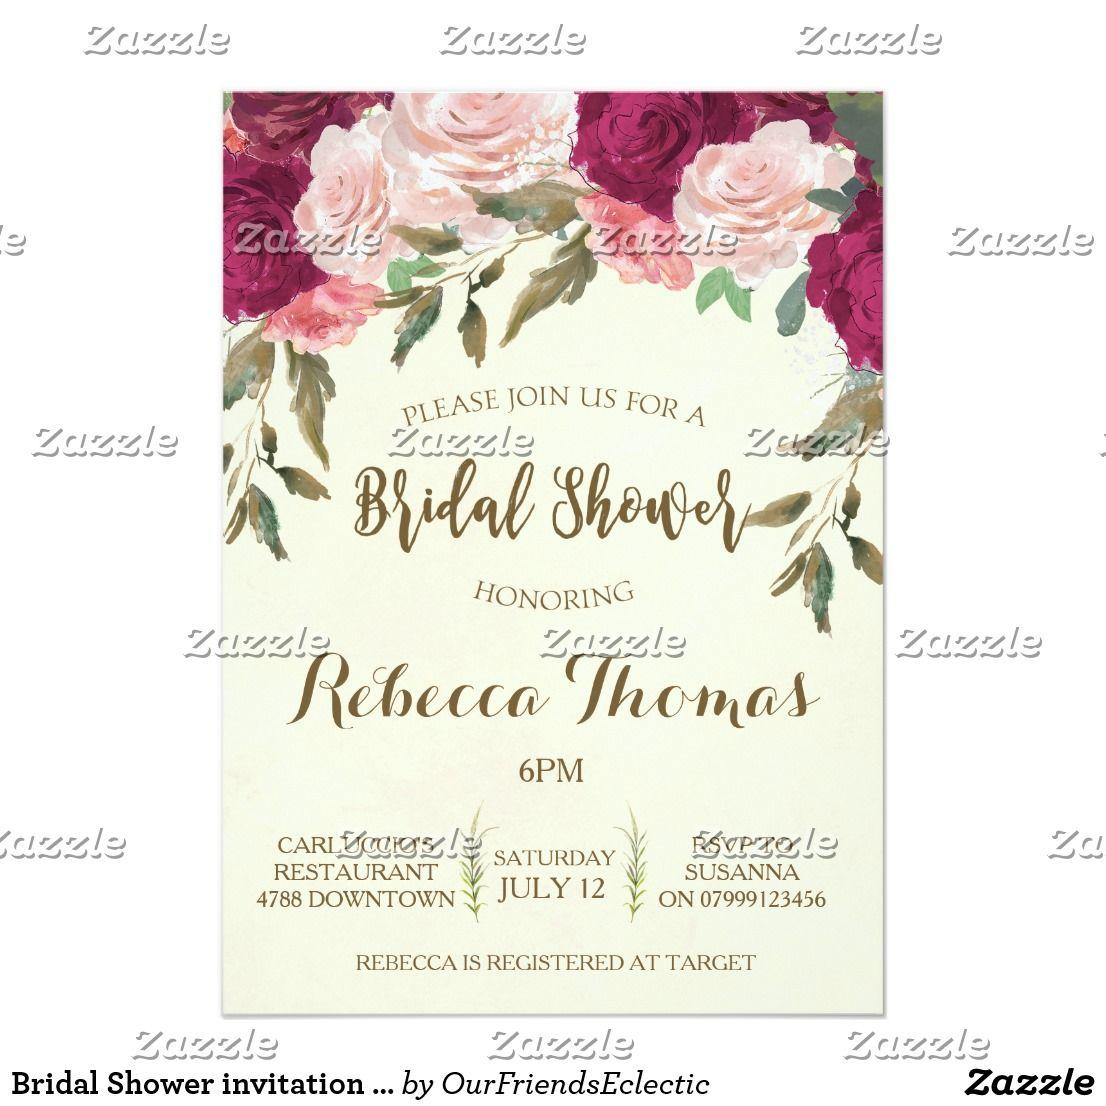 Bridal Shower invitation modern floral burgundy Zazzle